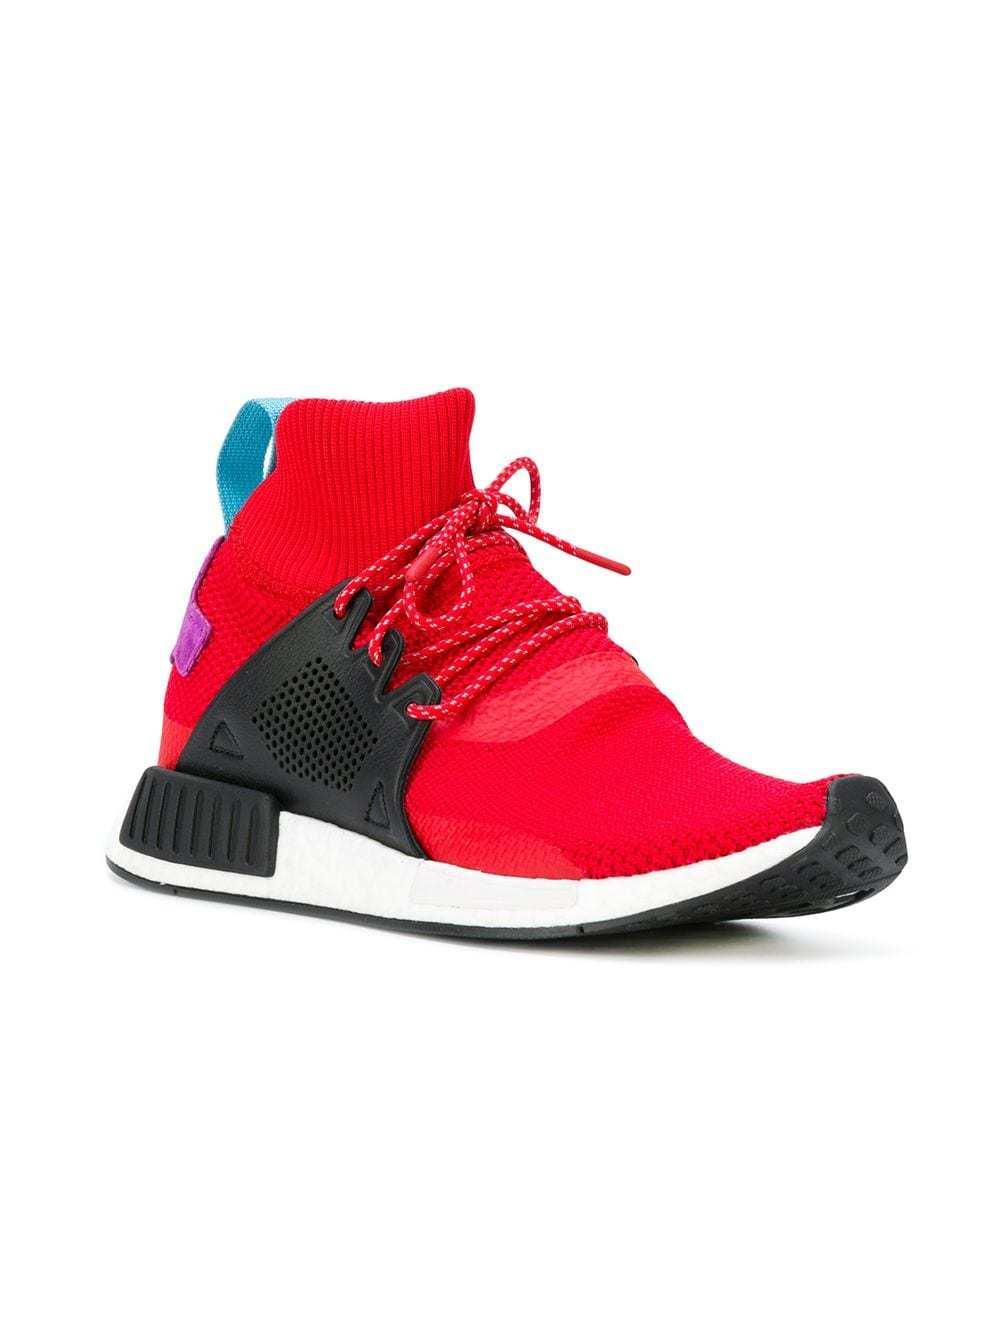 info for cdb33 a5781 adidas Originals Nmd Xr1 Winter Sneakers, 201  farfetch.com